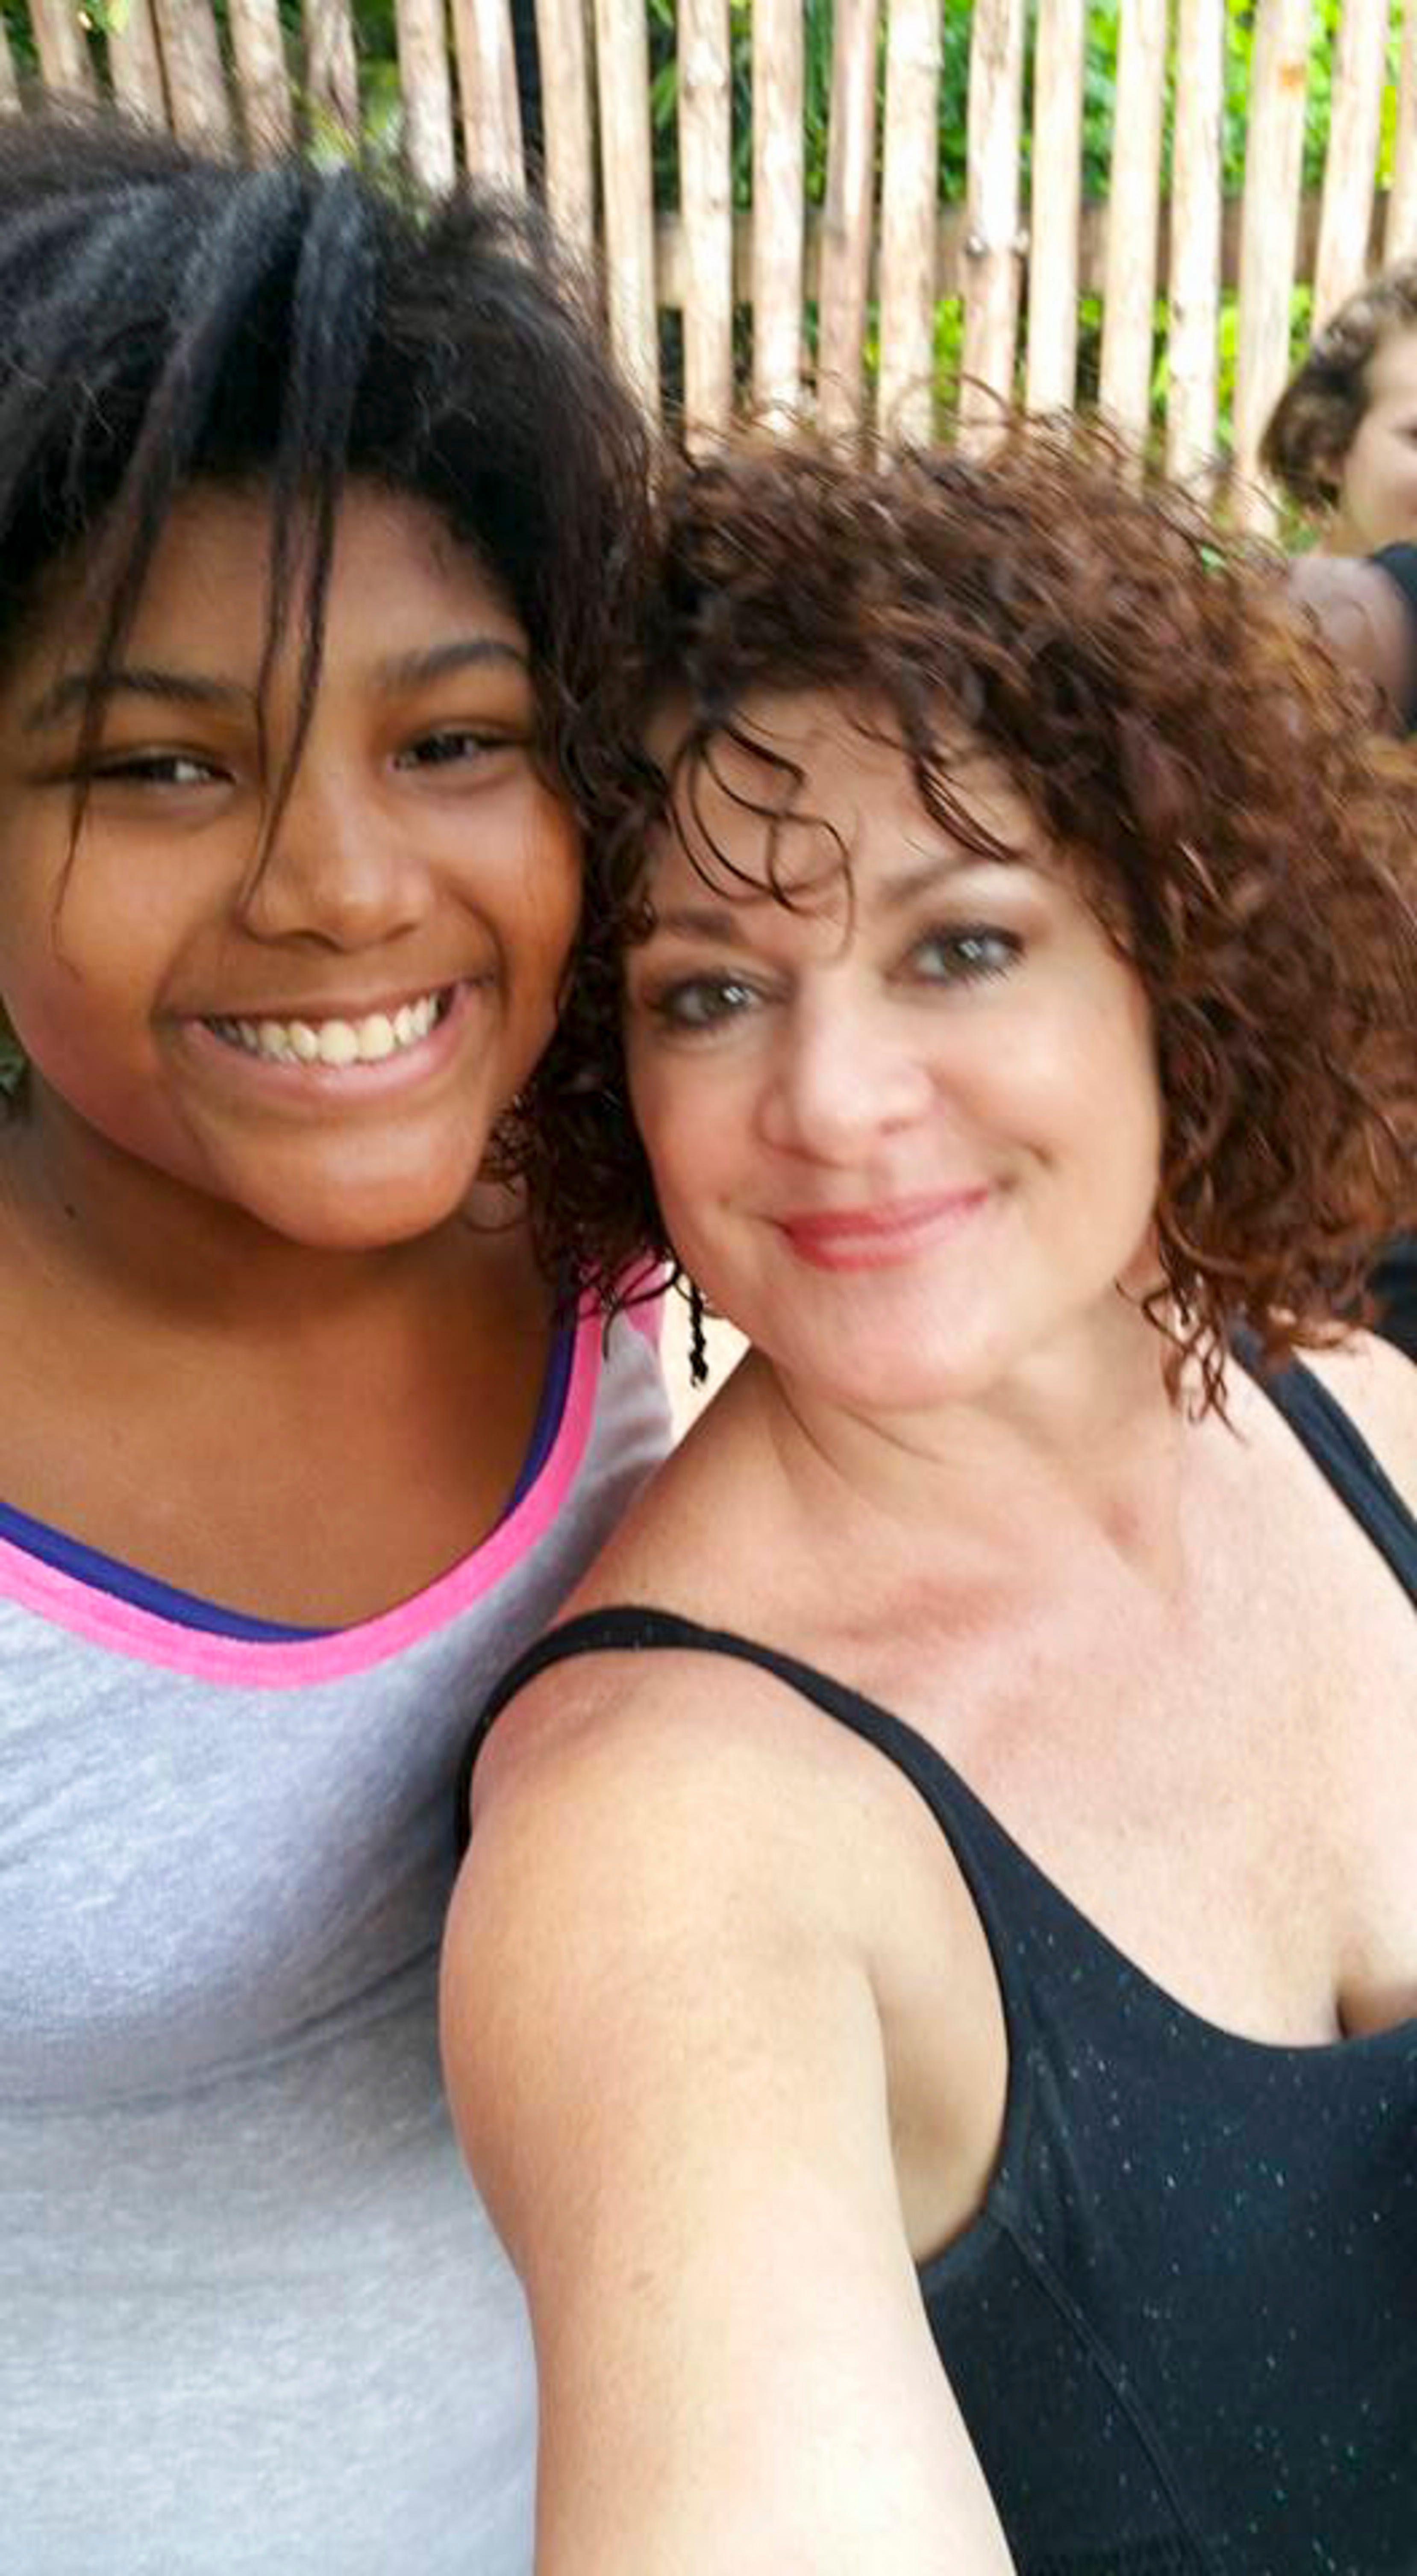 Anber and her former foster mom Karen Scott on Dec. 27, 2015.